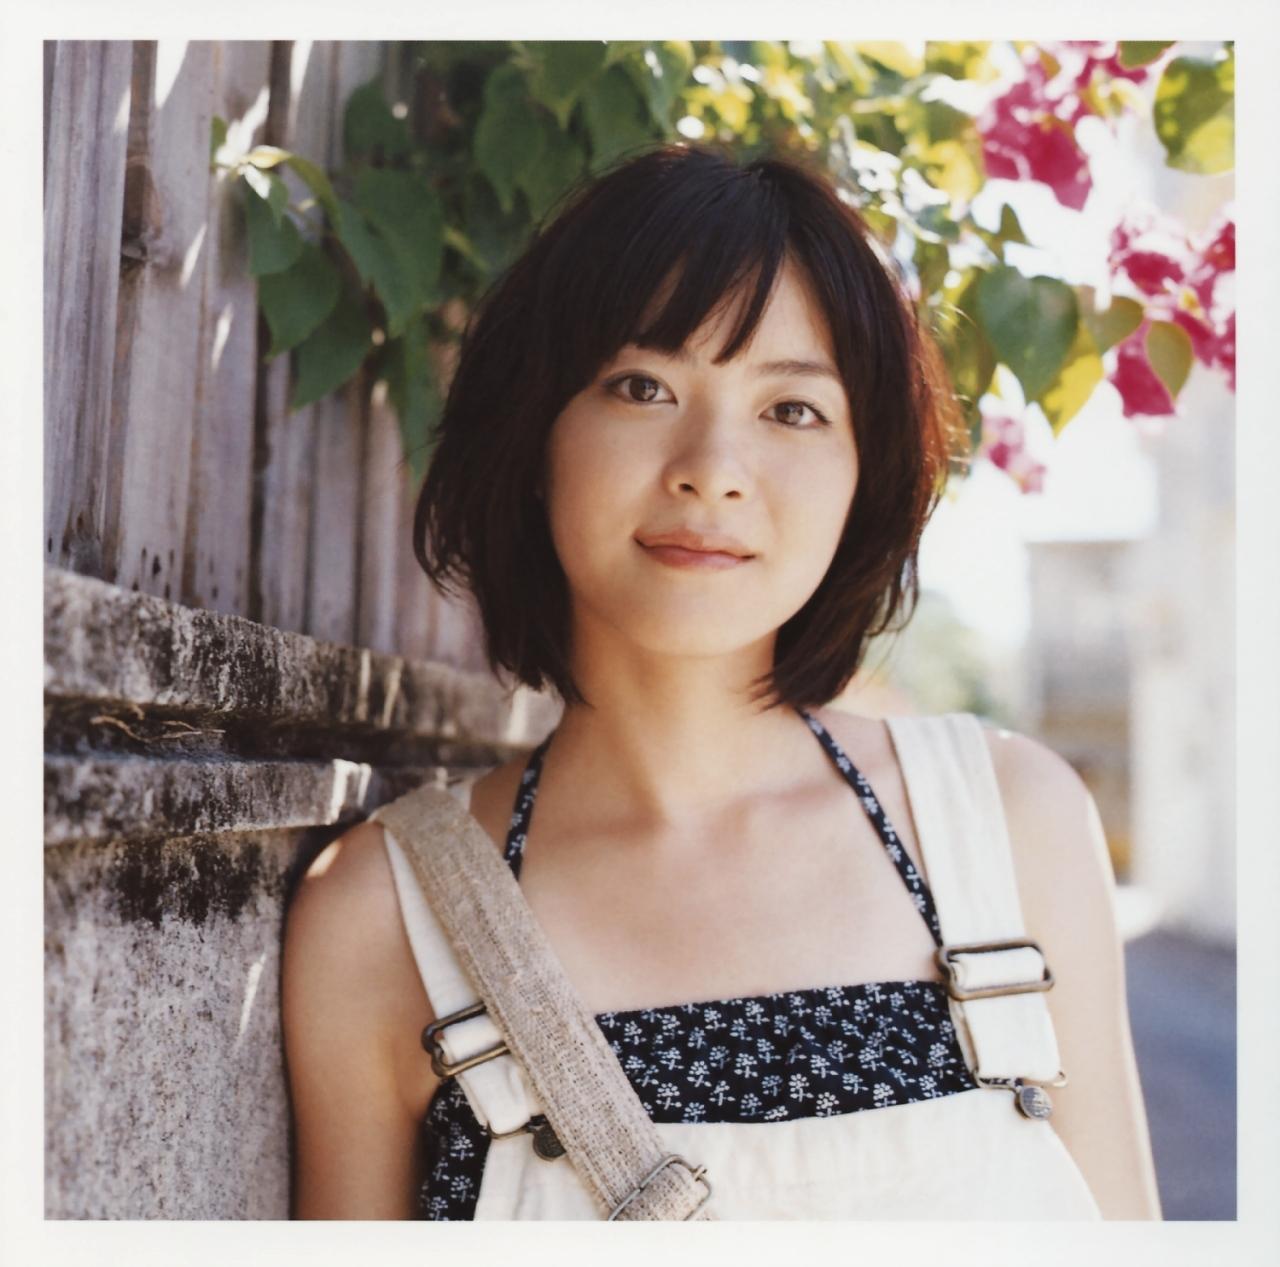 Chiaki Shinchi From Nodame Cantabile Live Action By: Juri Ueno